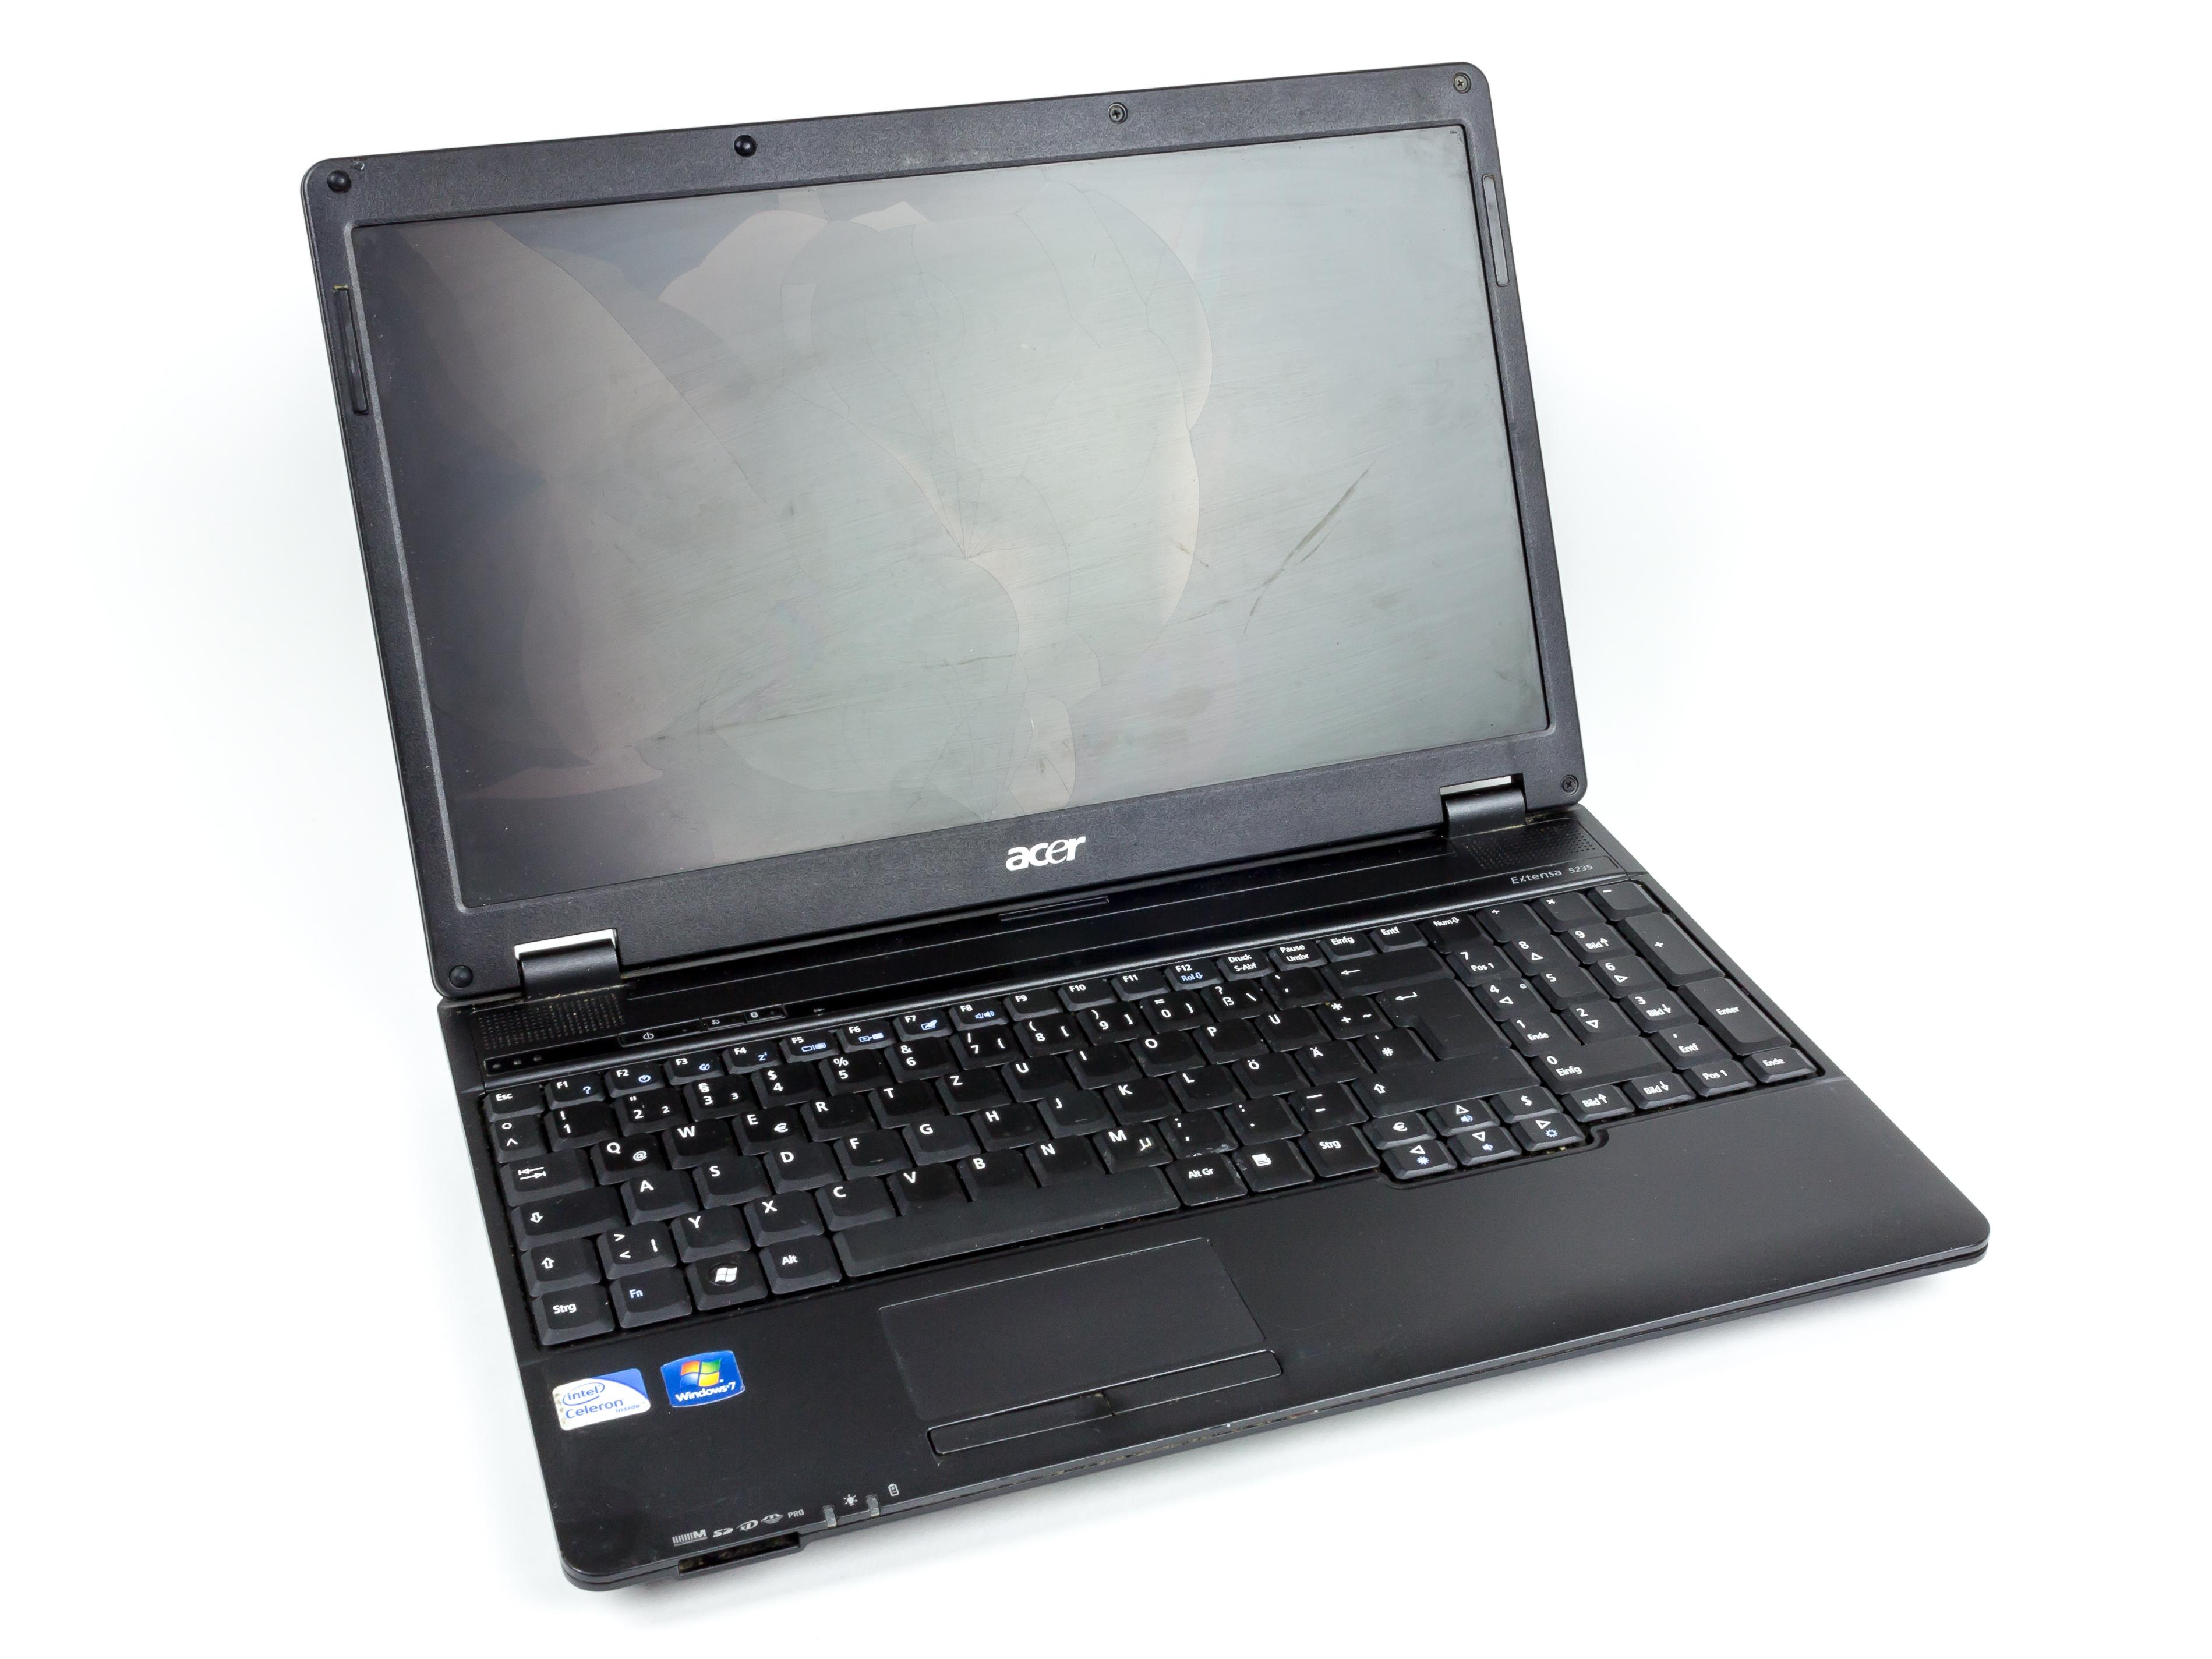 Acer Extensa 5235 Notebook Drivers for Windows